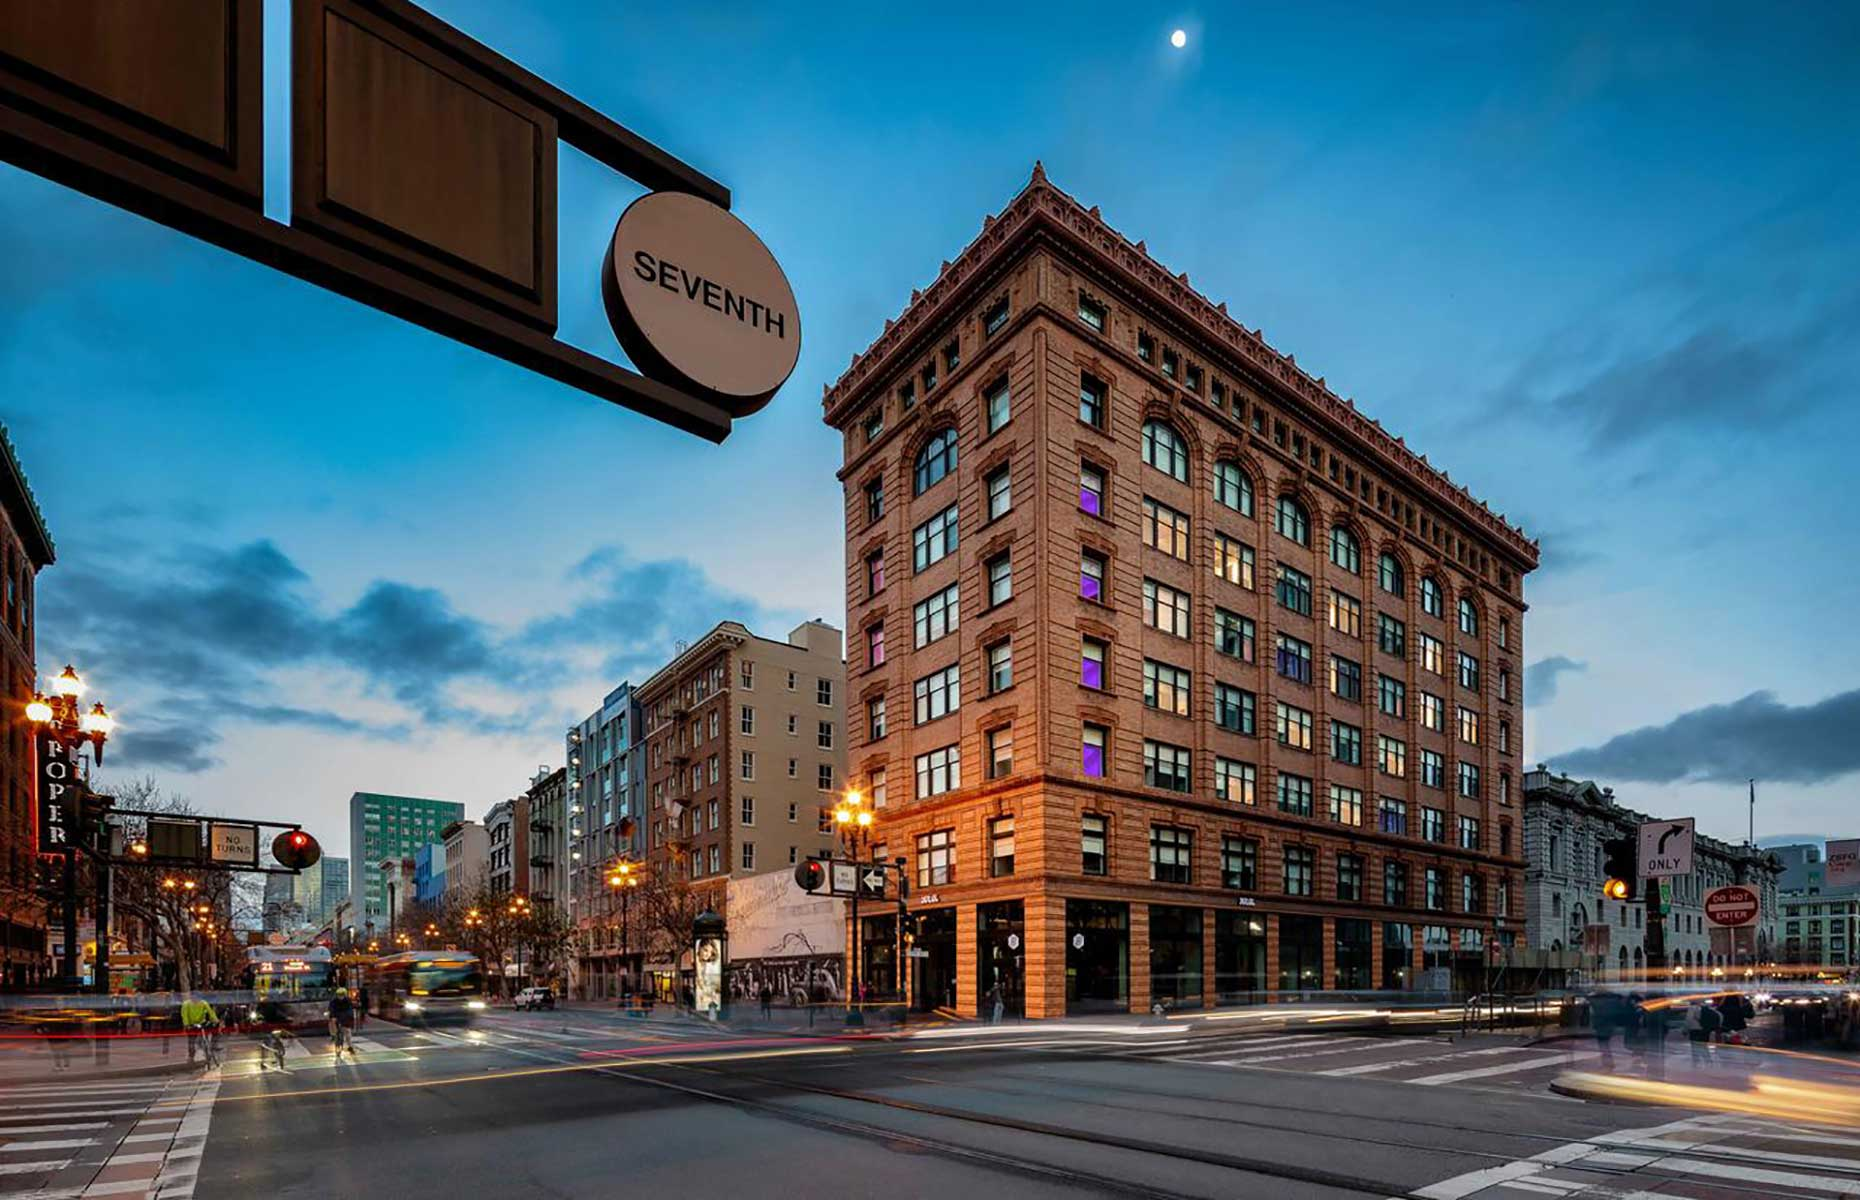 YOTEL San Francisco (Image: Yotel San Francisco/booking.com)